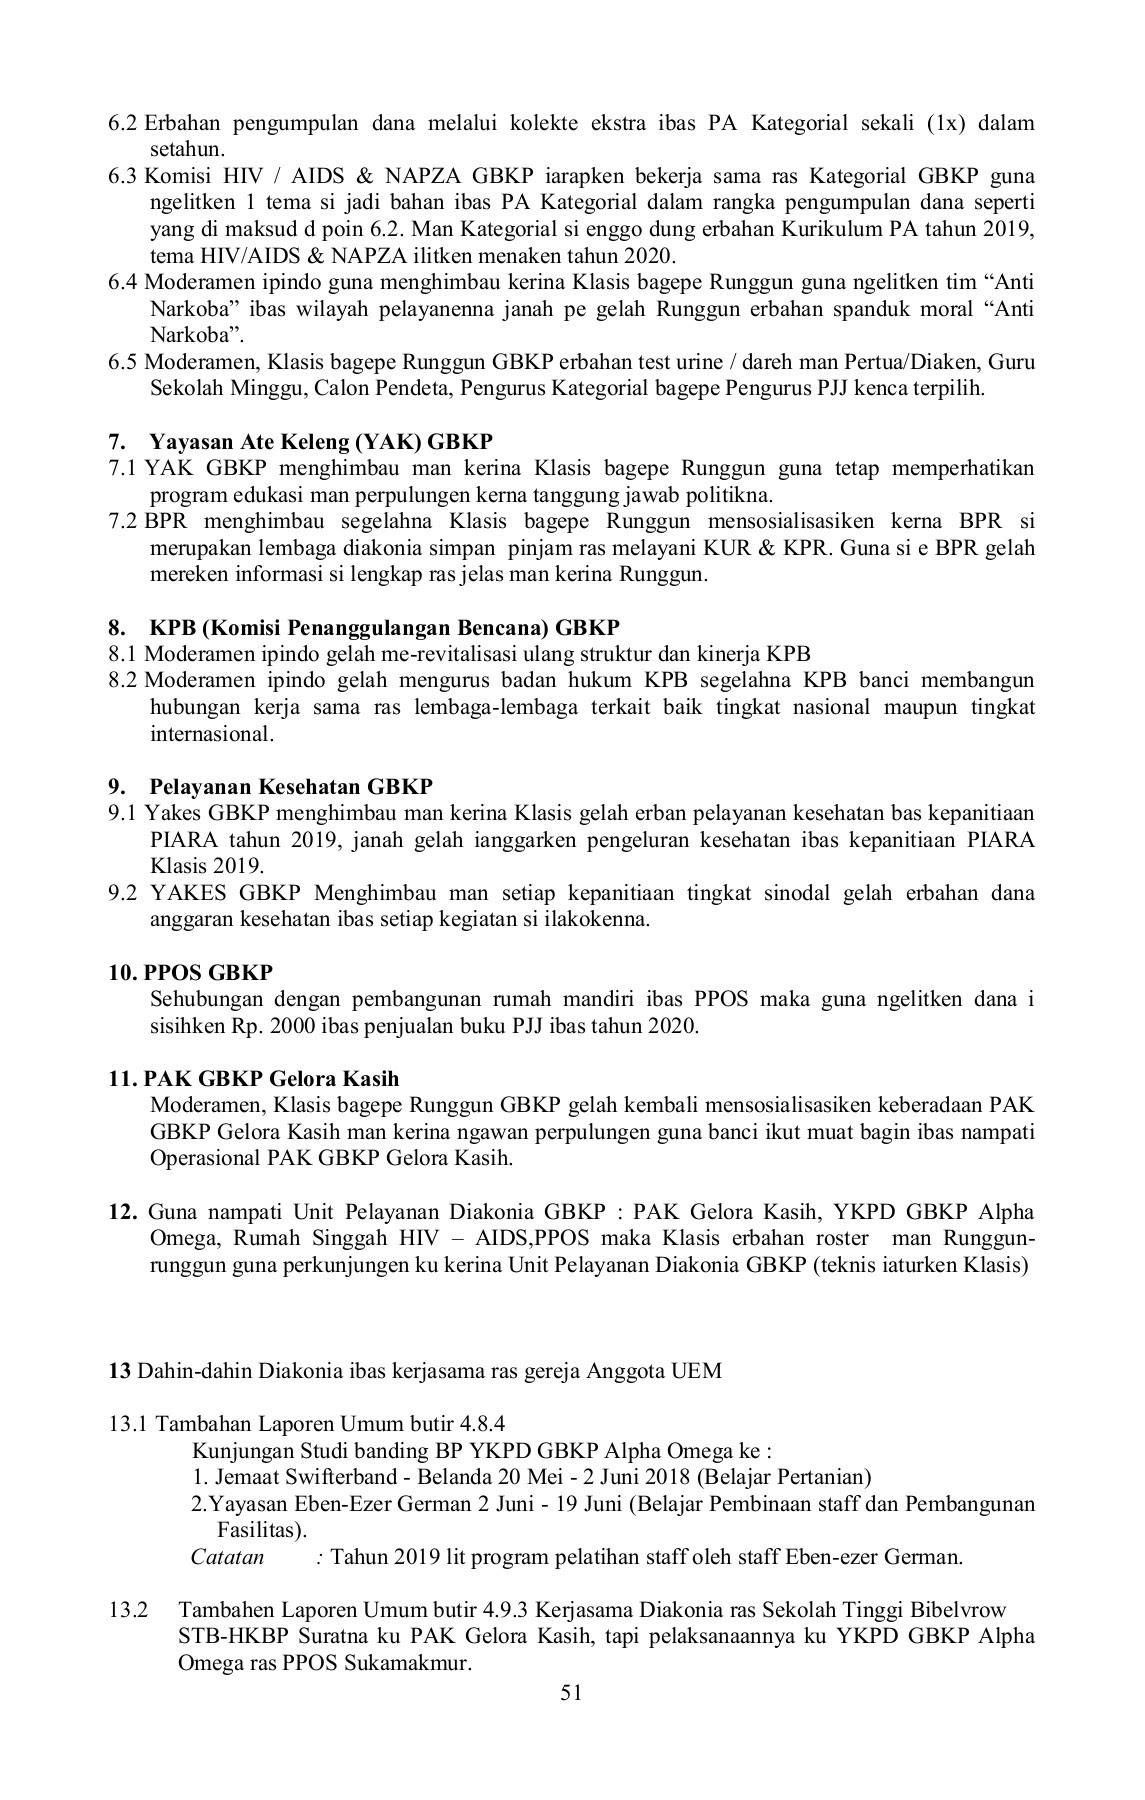 Keputusan Skms 2018 Pages 51 100 Text Version Fliphtml5